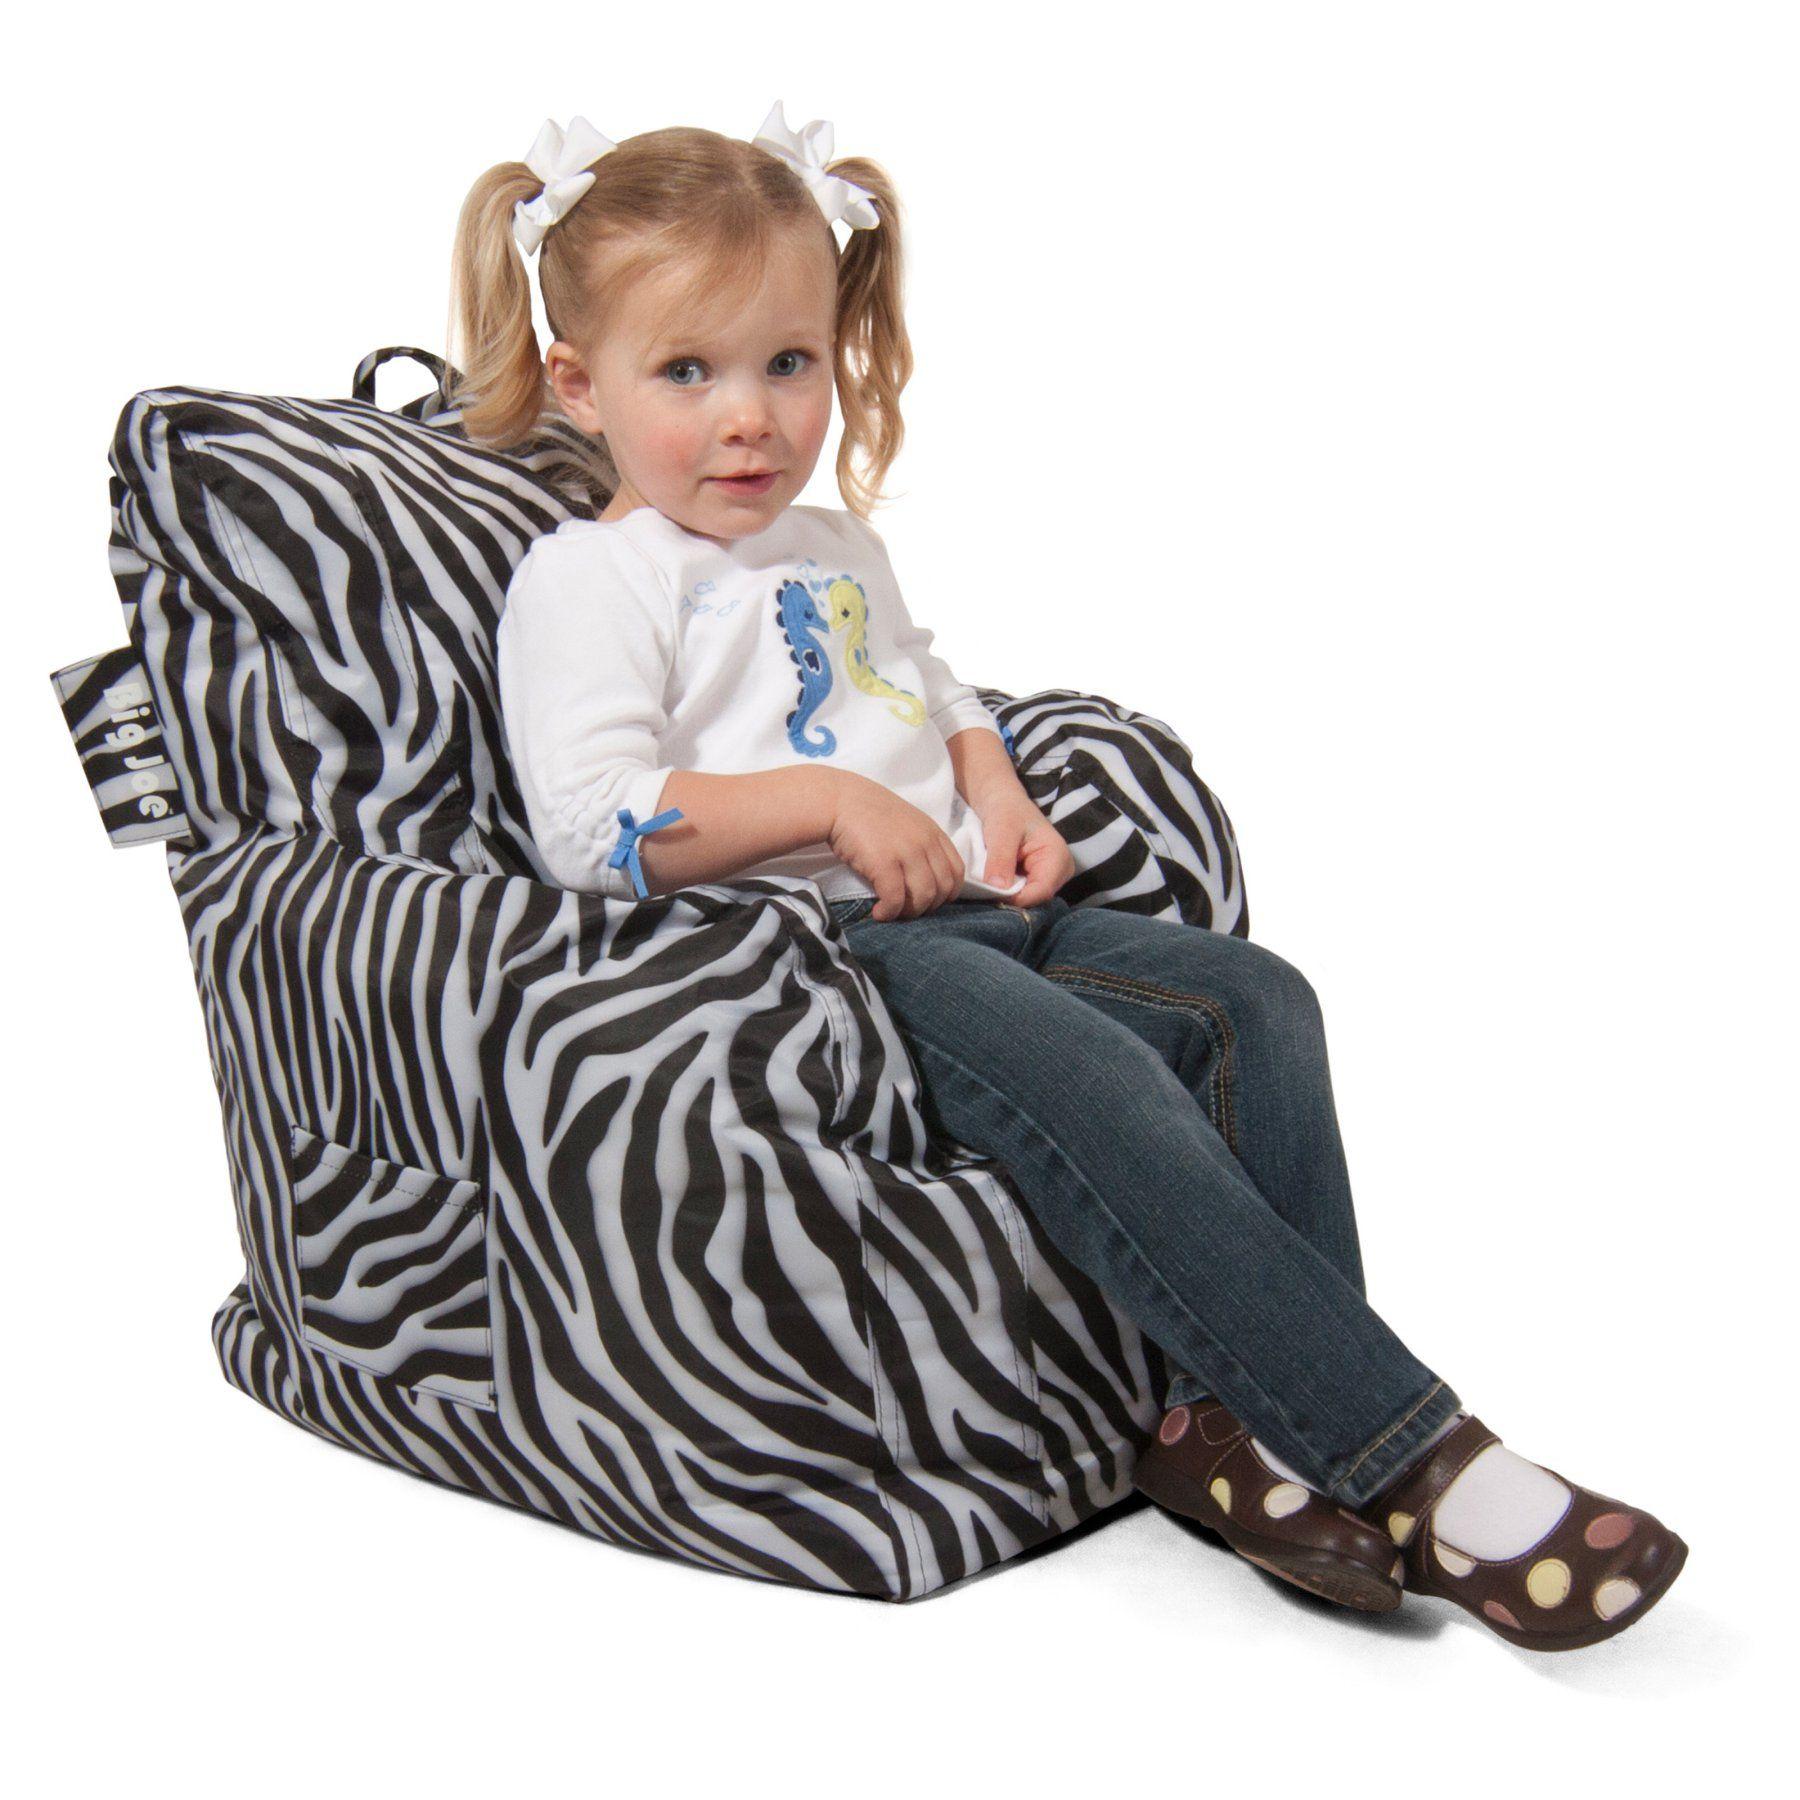 Big Joe Cuddle Chair In Smartmax Zebra 0652182 Cuddle Chair